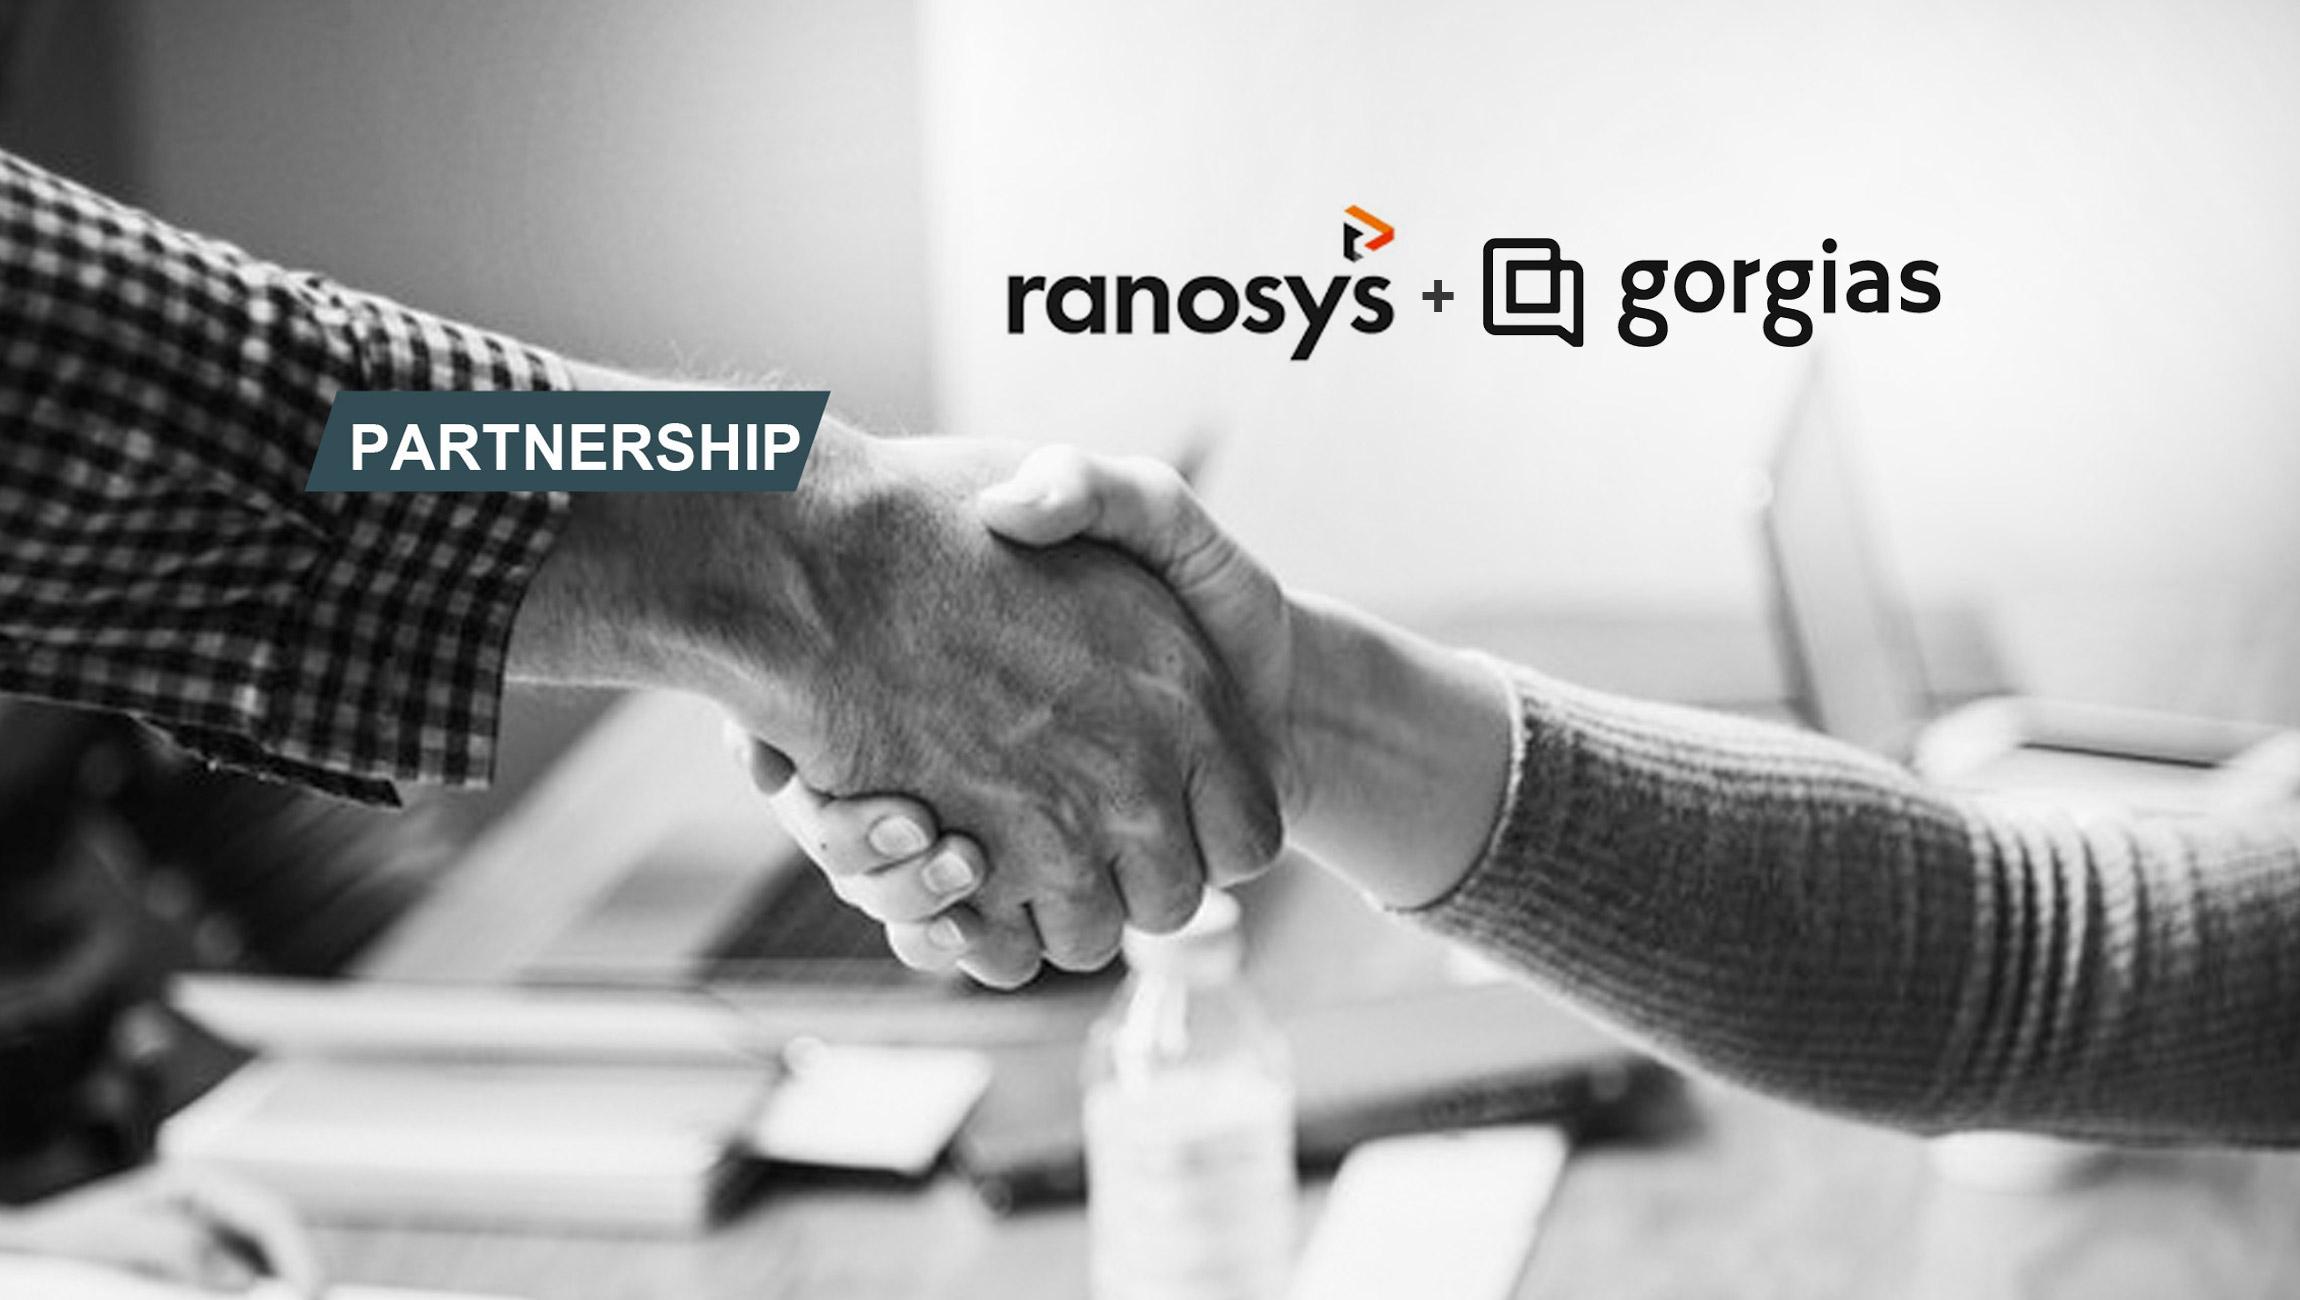 Ranosys Partners with Gorgias - a leading eCommerce Helpdesk